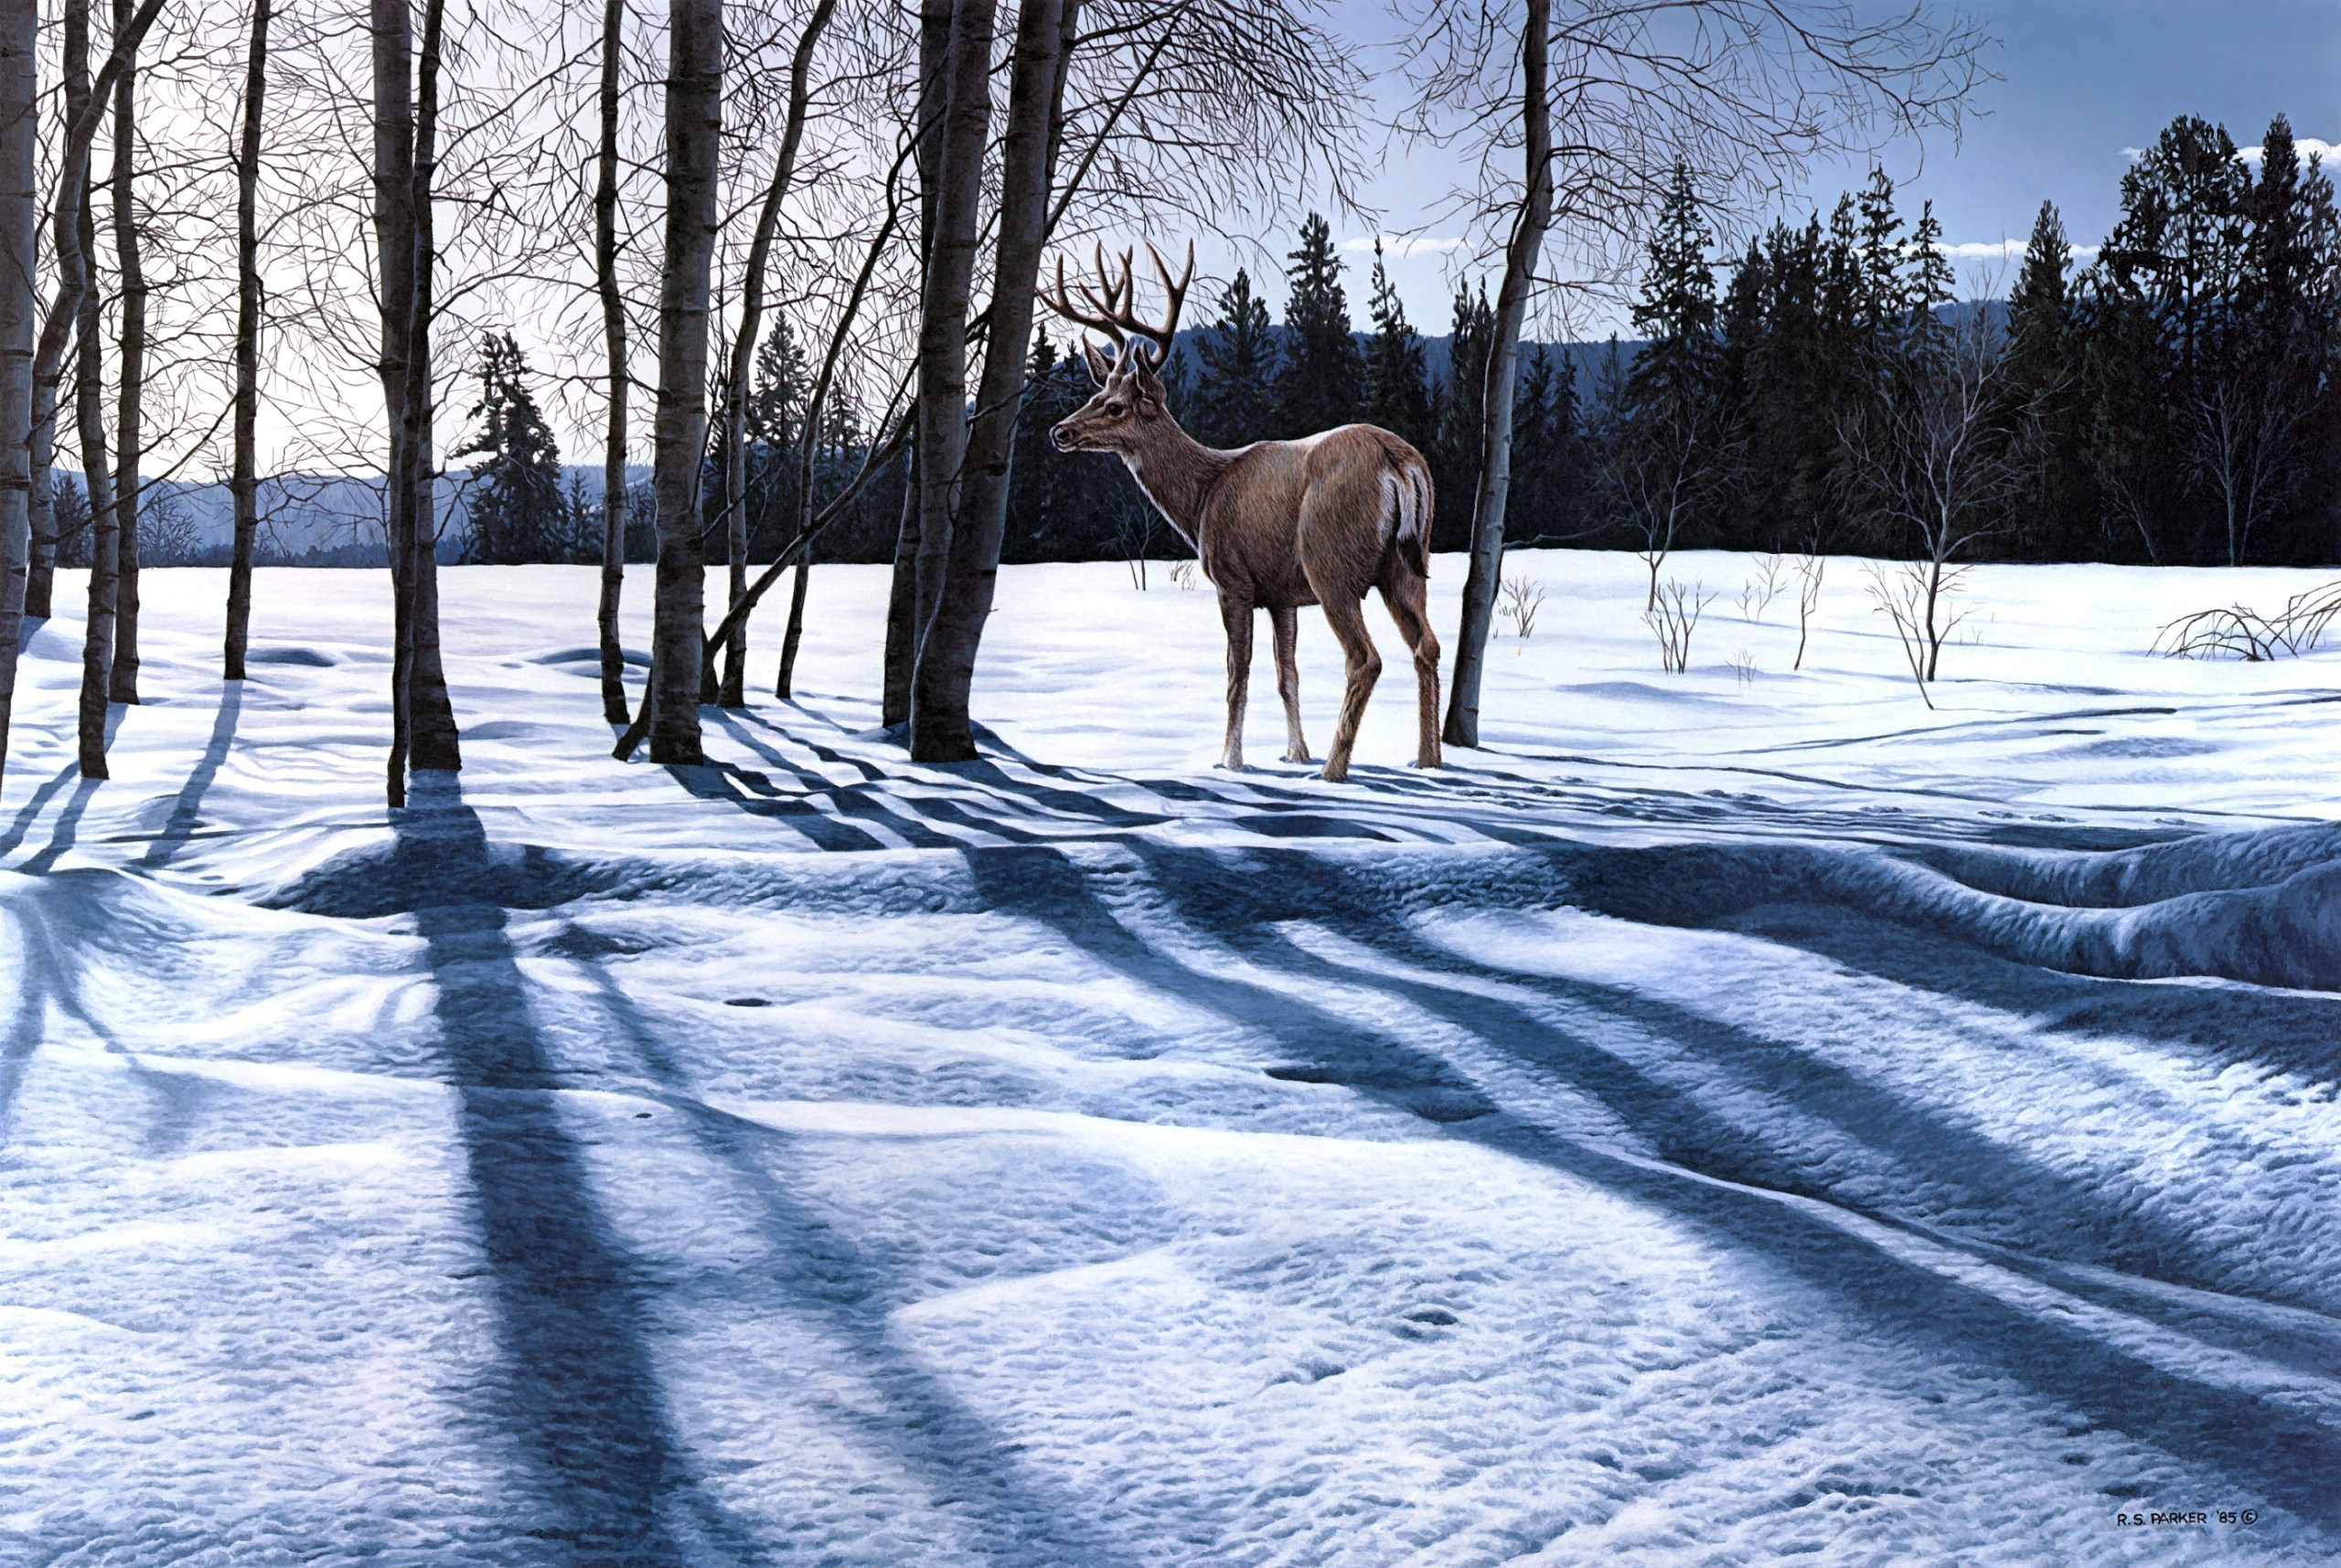 Landscape deer winter snow wallpaper 2560x1715 133377 2560x1715